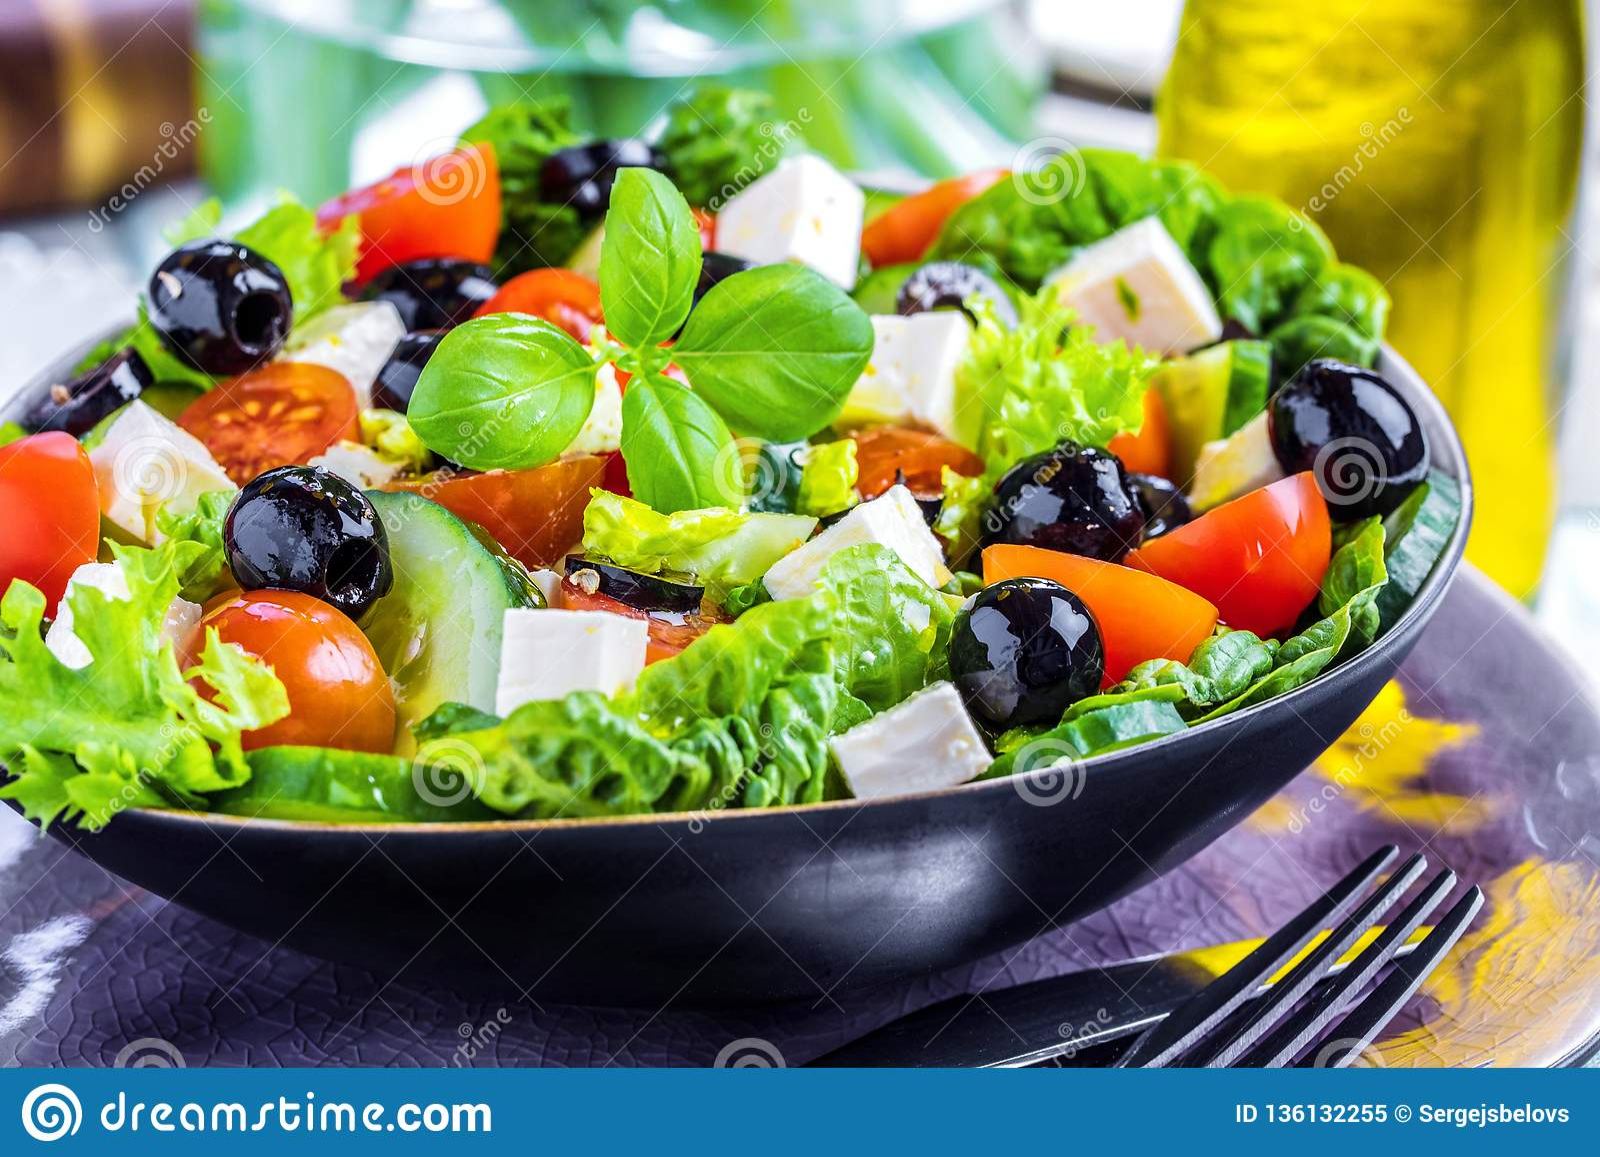 Verse groenten Griekse salade Gezond voedsel op houten achtergrond